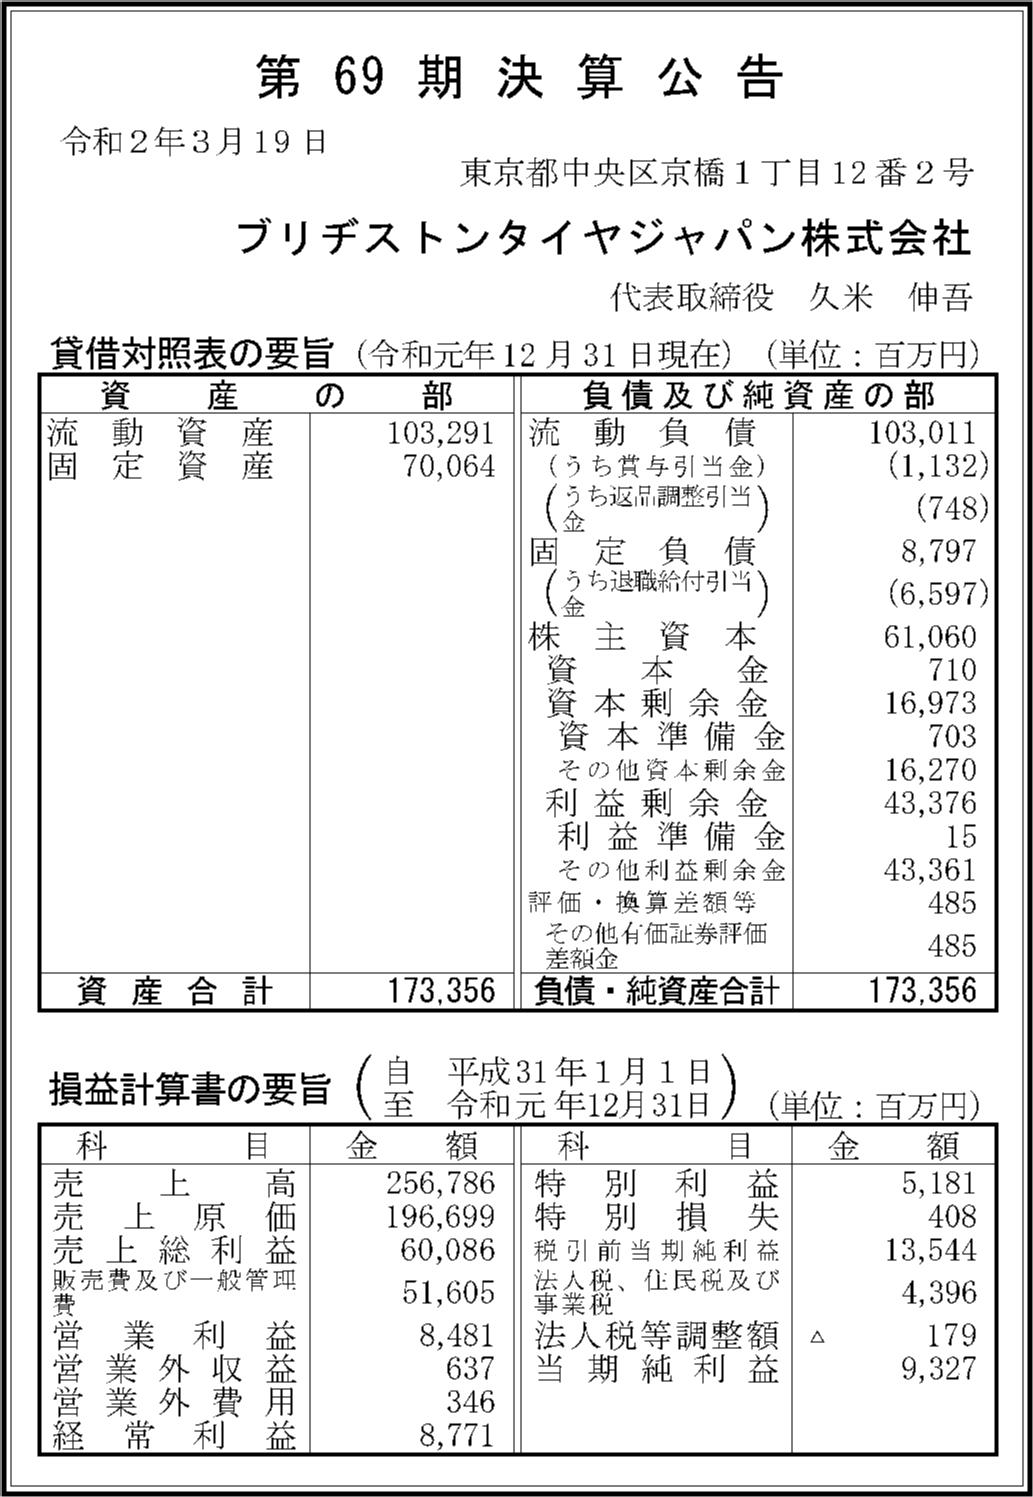 0222 c8ceb51b74d087eb7b0ba5ebd50f3e9a94cd010c976e9f08350fe6217e4d18a586569b33ec4bec3ceca70ea5a4b772a26c20f4c780dd68b084a1f7c21e3b64a9 04